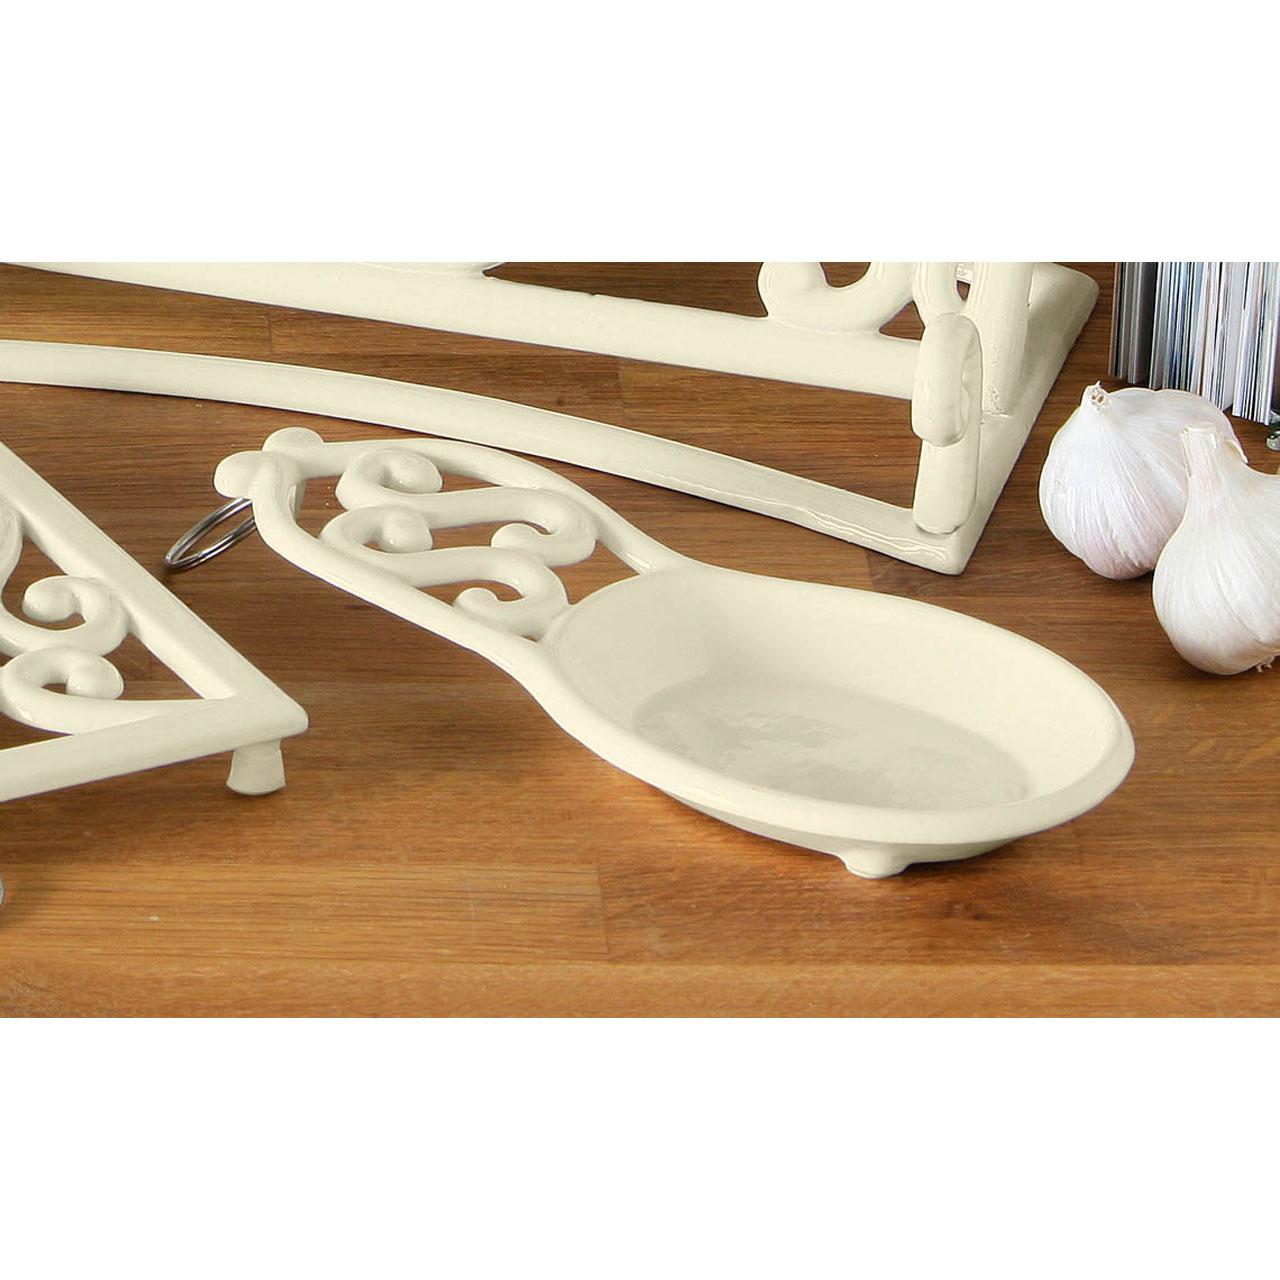 Cream Cast Iron Trivet Mug Tree Kitchen Roll Holder Spoon